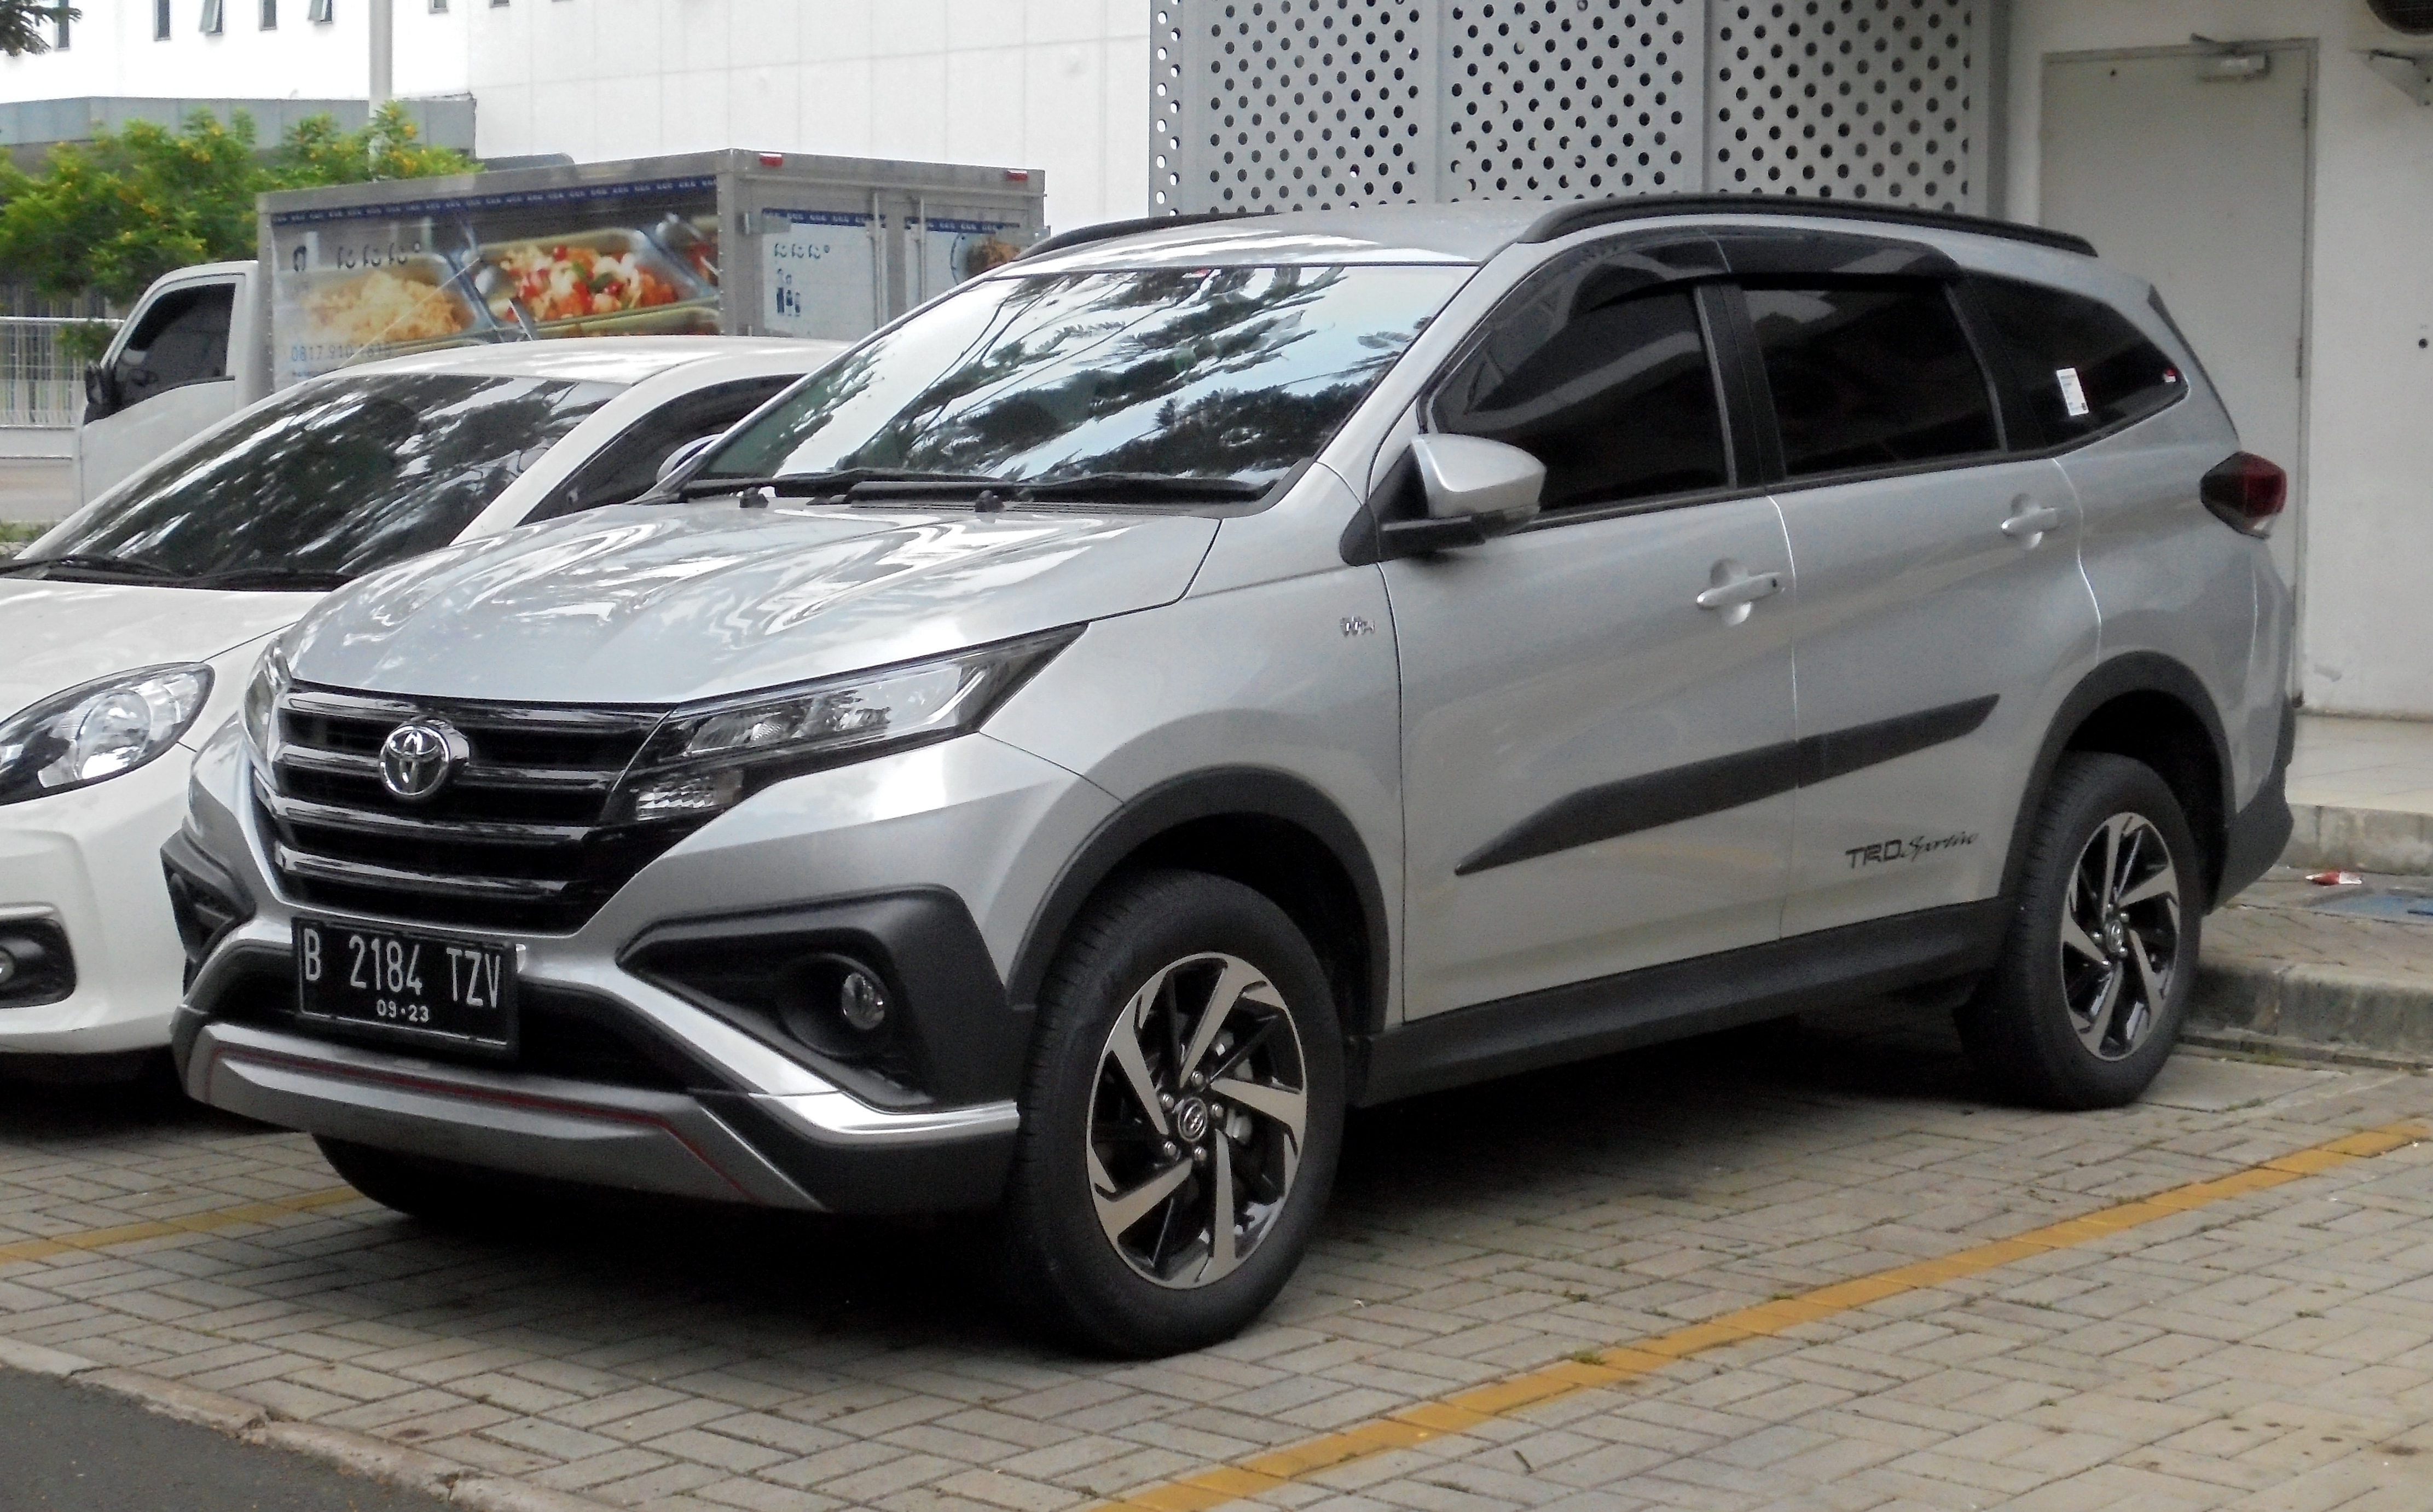 File:2018 Toyota Rush 1.5 TRD Sportivo Wagon (F800RE; 12